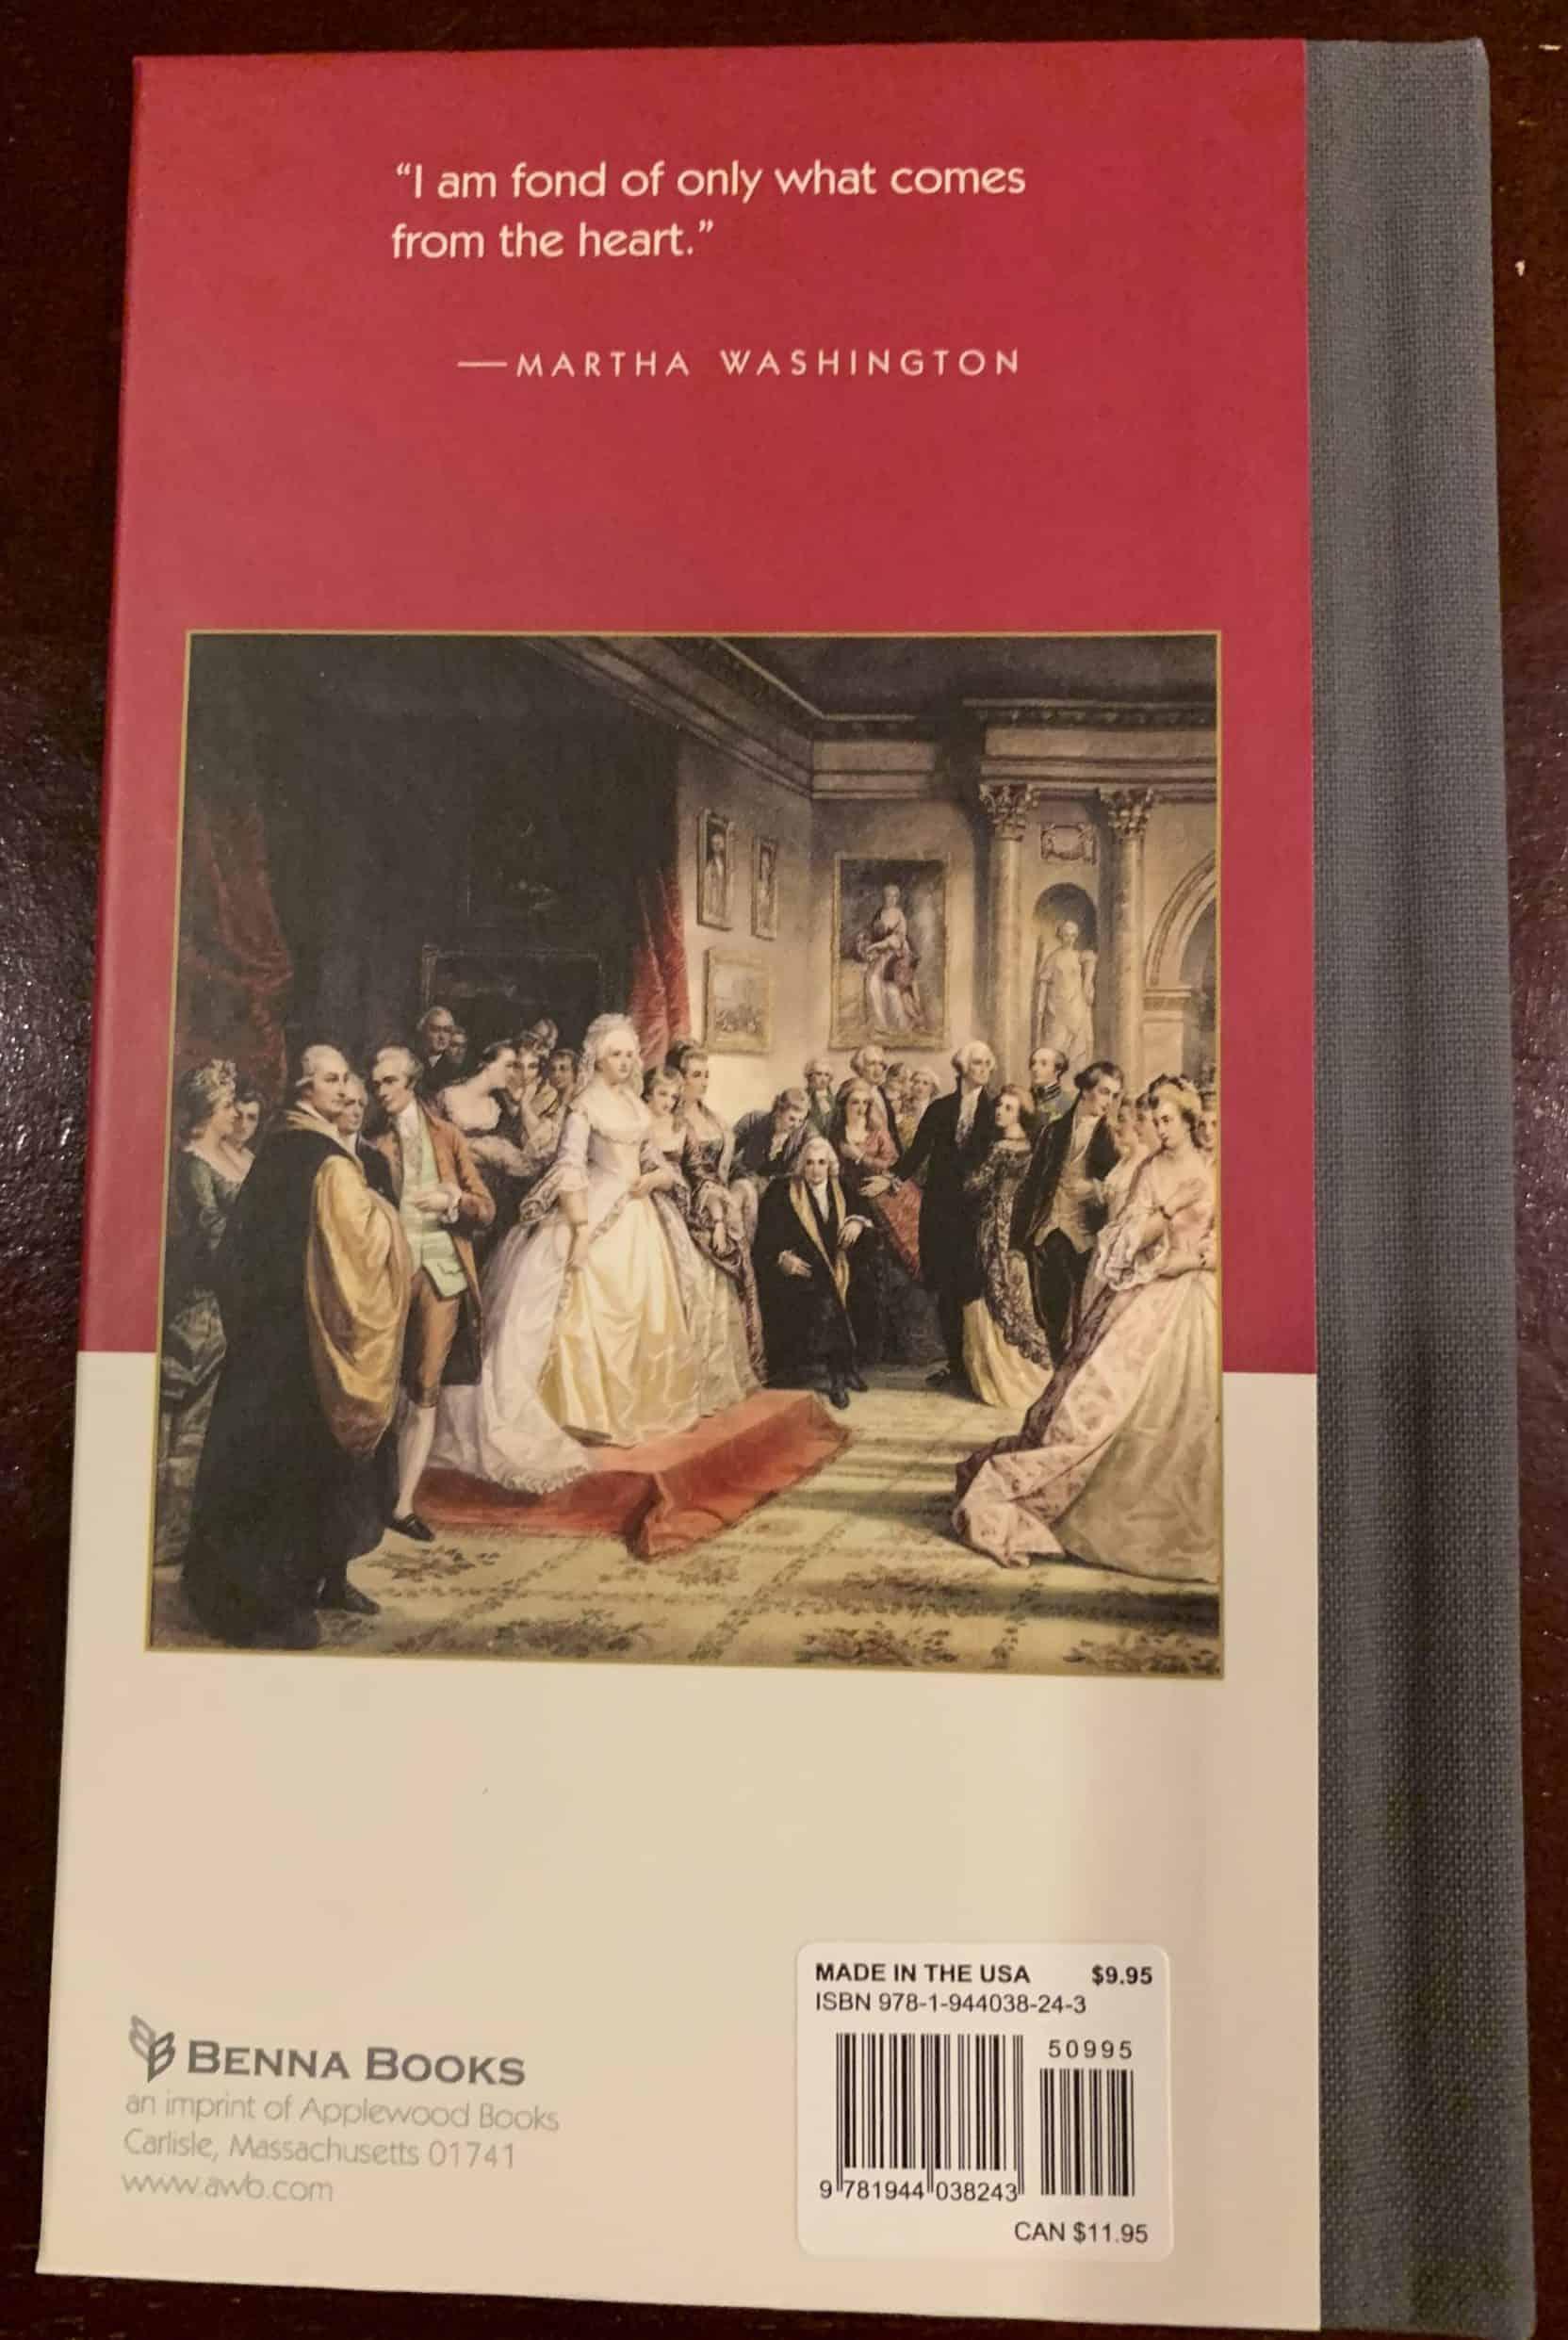 A Short Biography of Martha Washington